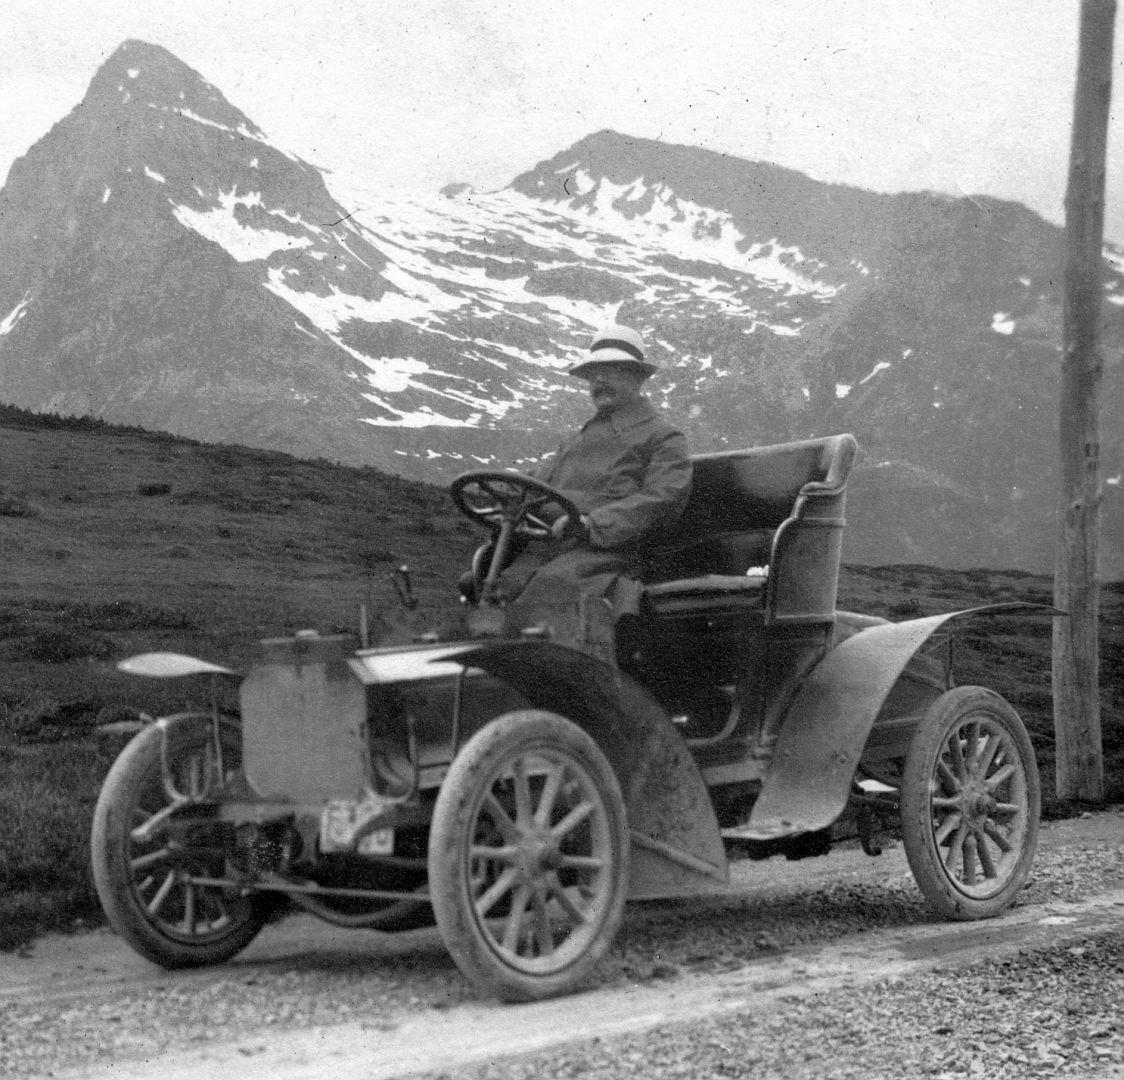 Peugeot_Zweisitzer_1903-04_Alpen_Galerie